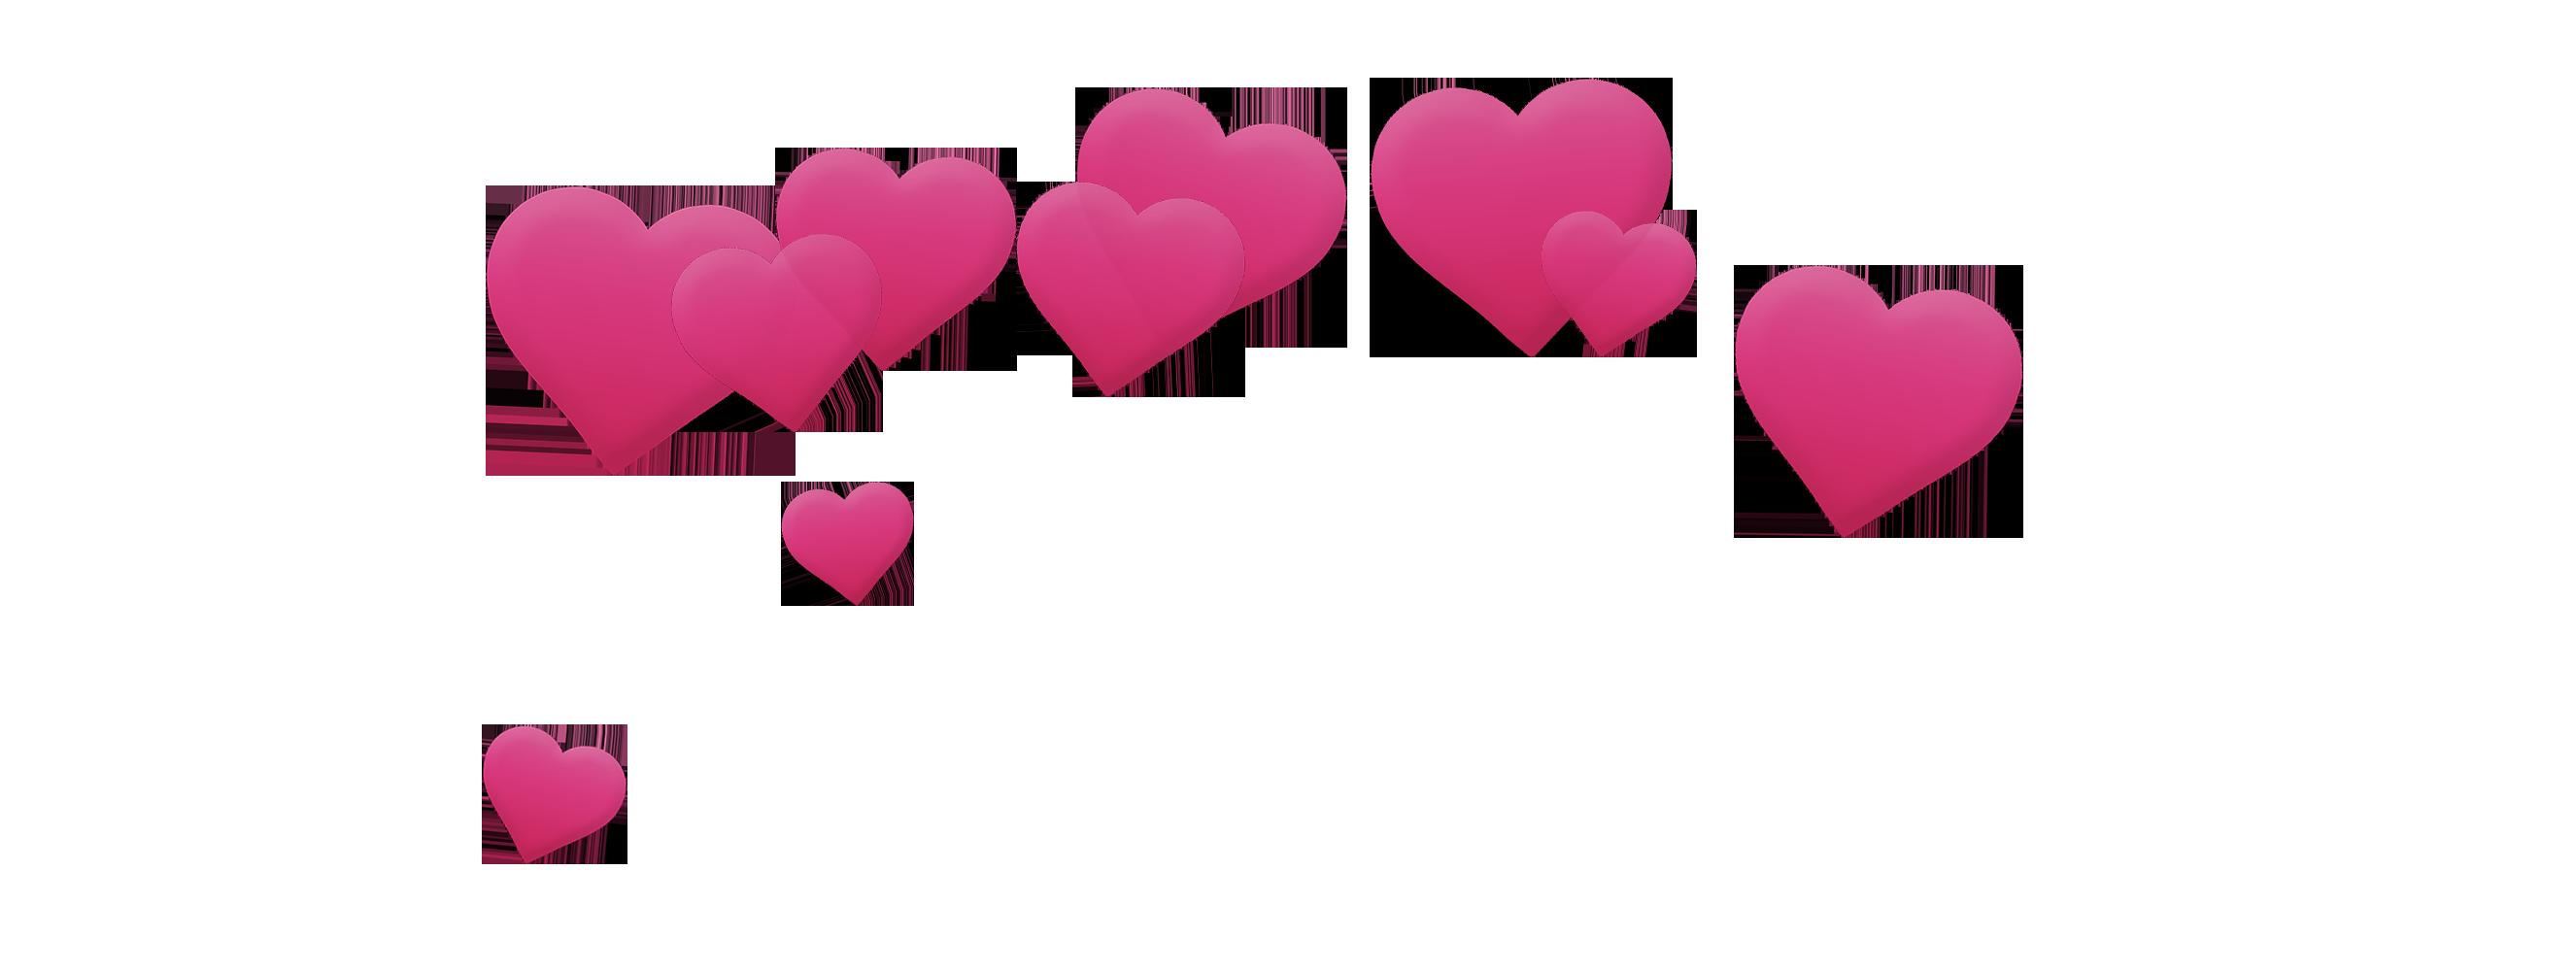 Heart picsart photo studio. Photobooth hearts png